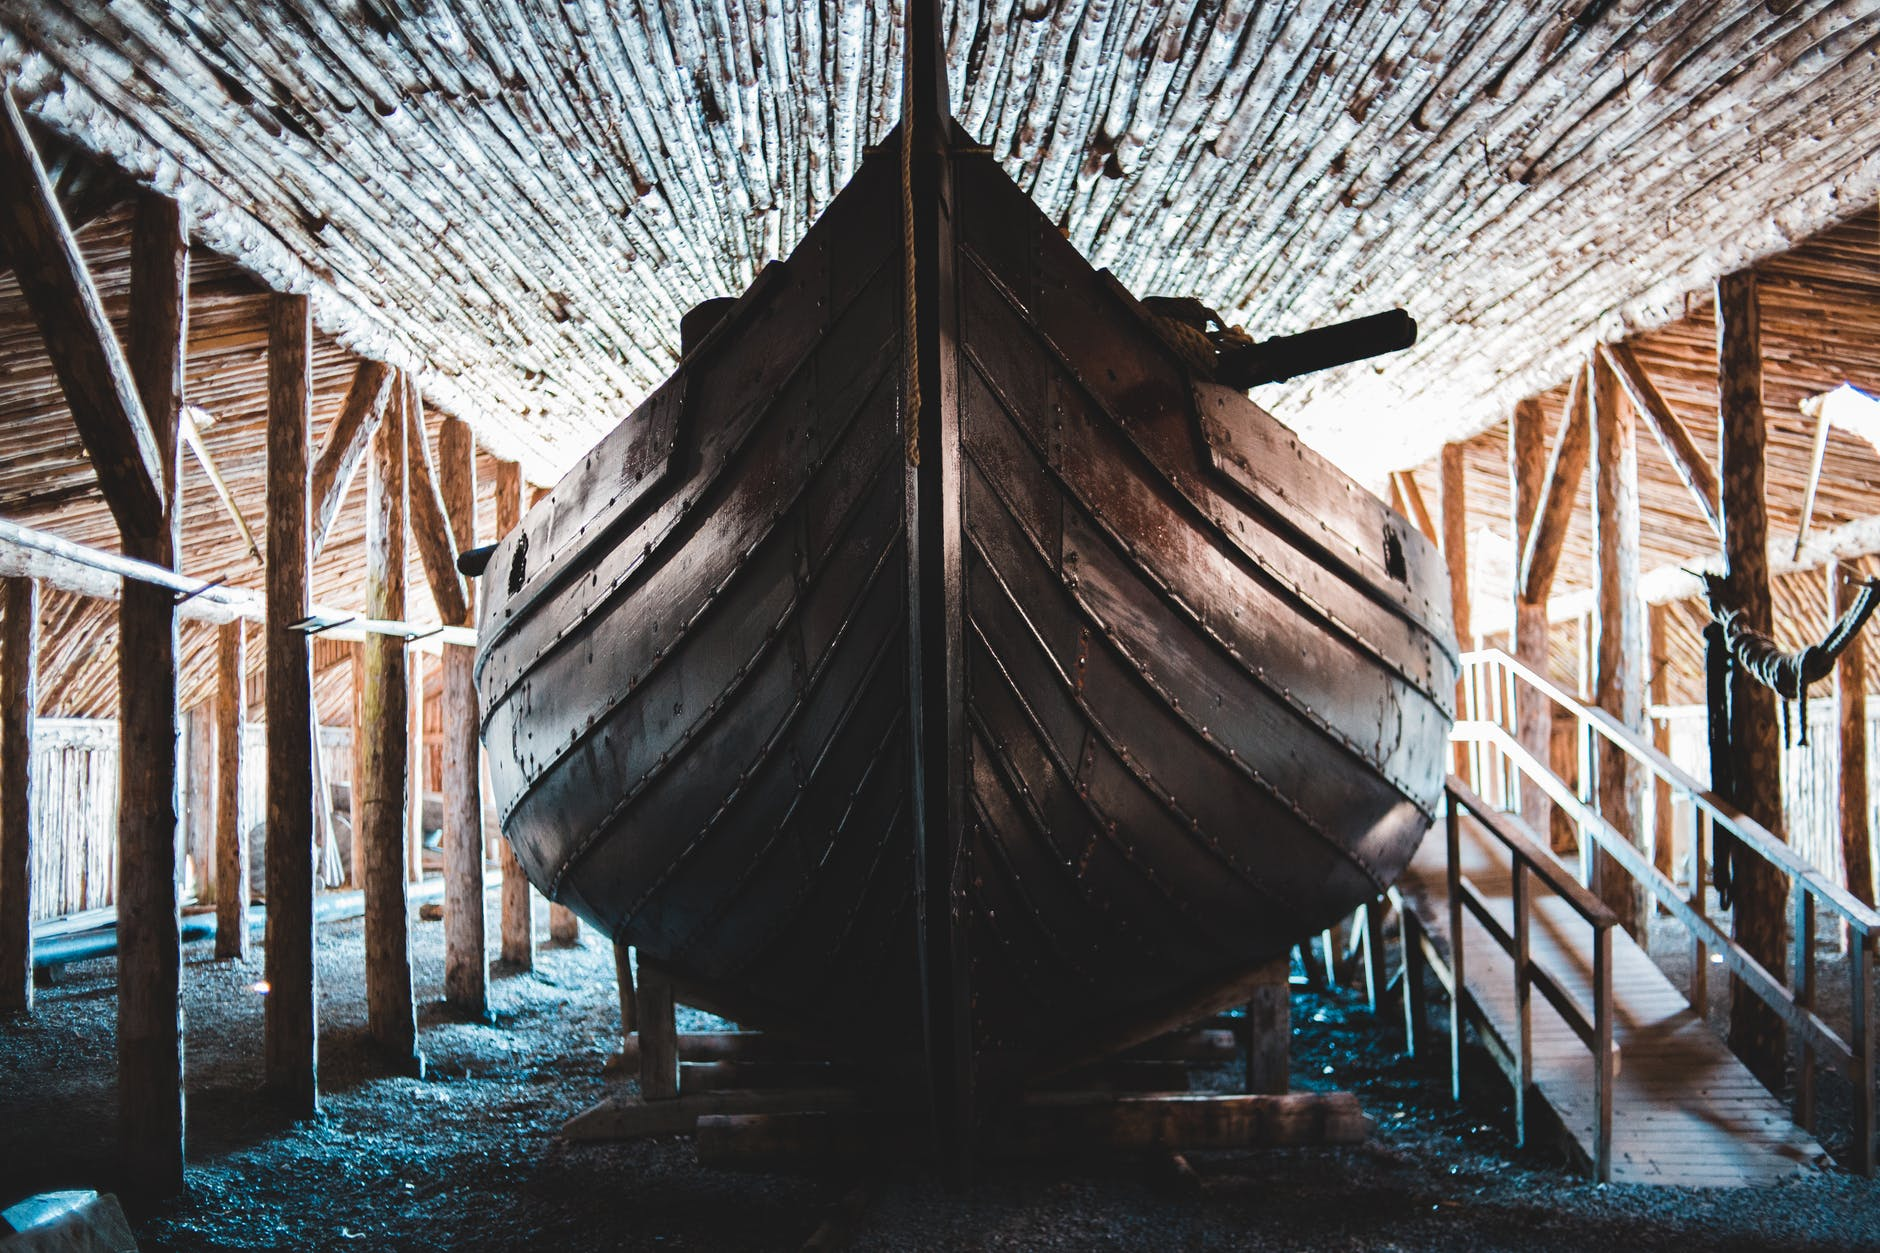 A Viking longship in a boathouse.